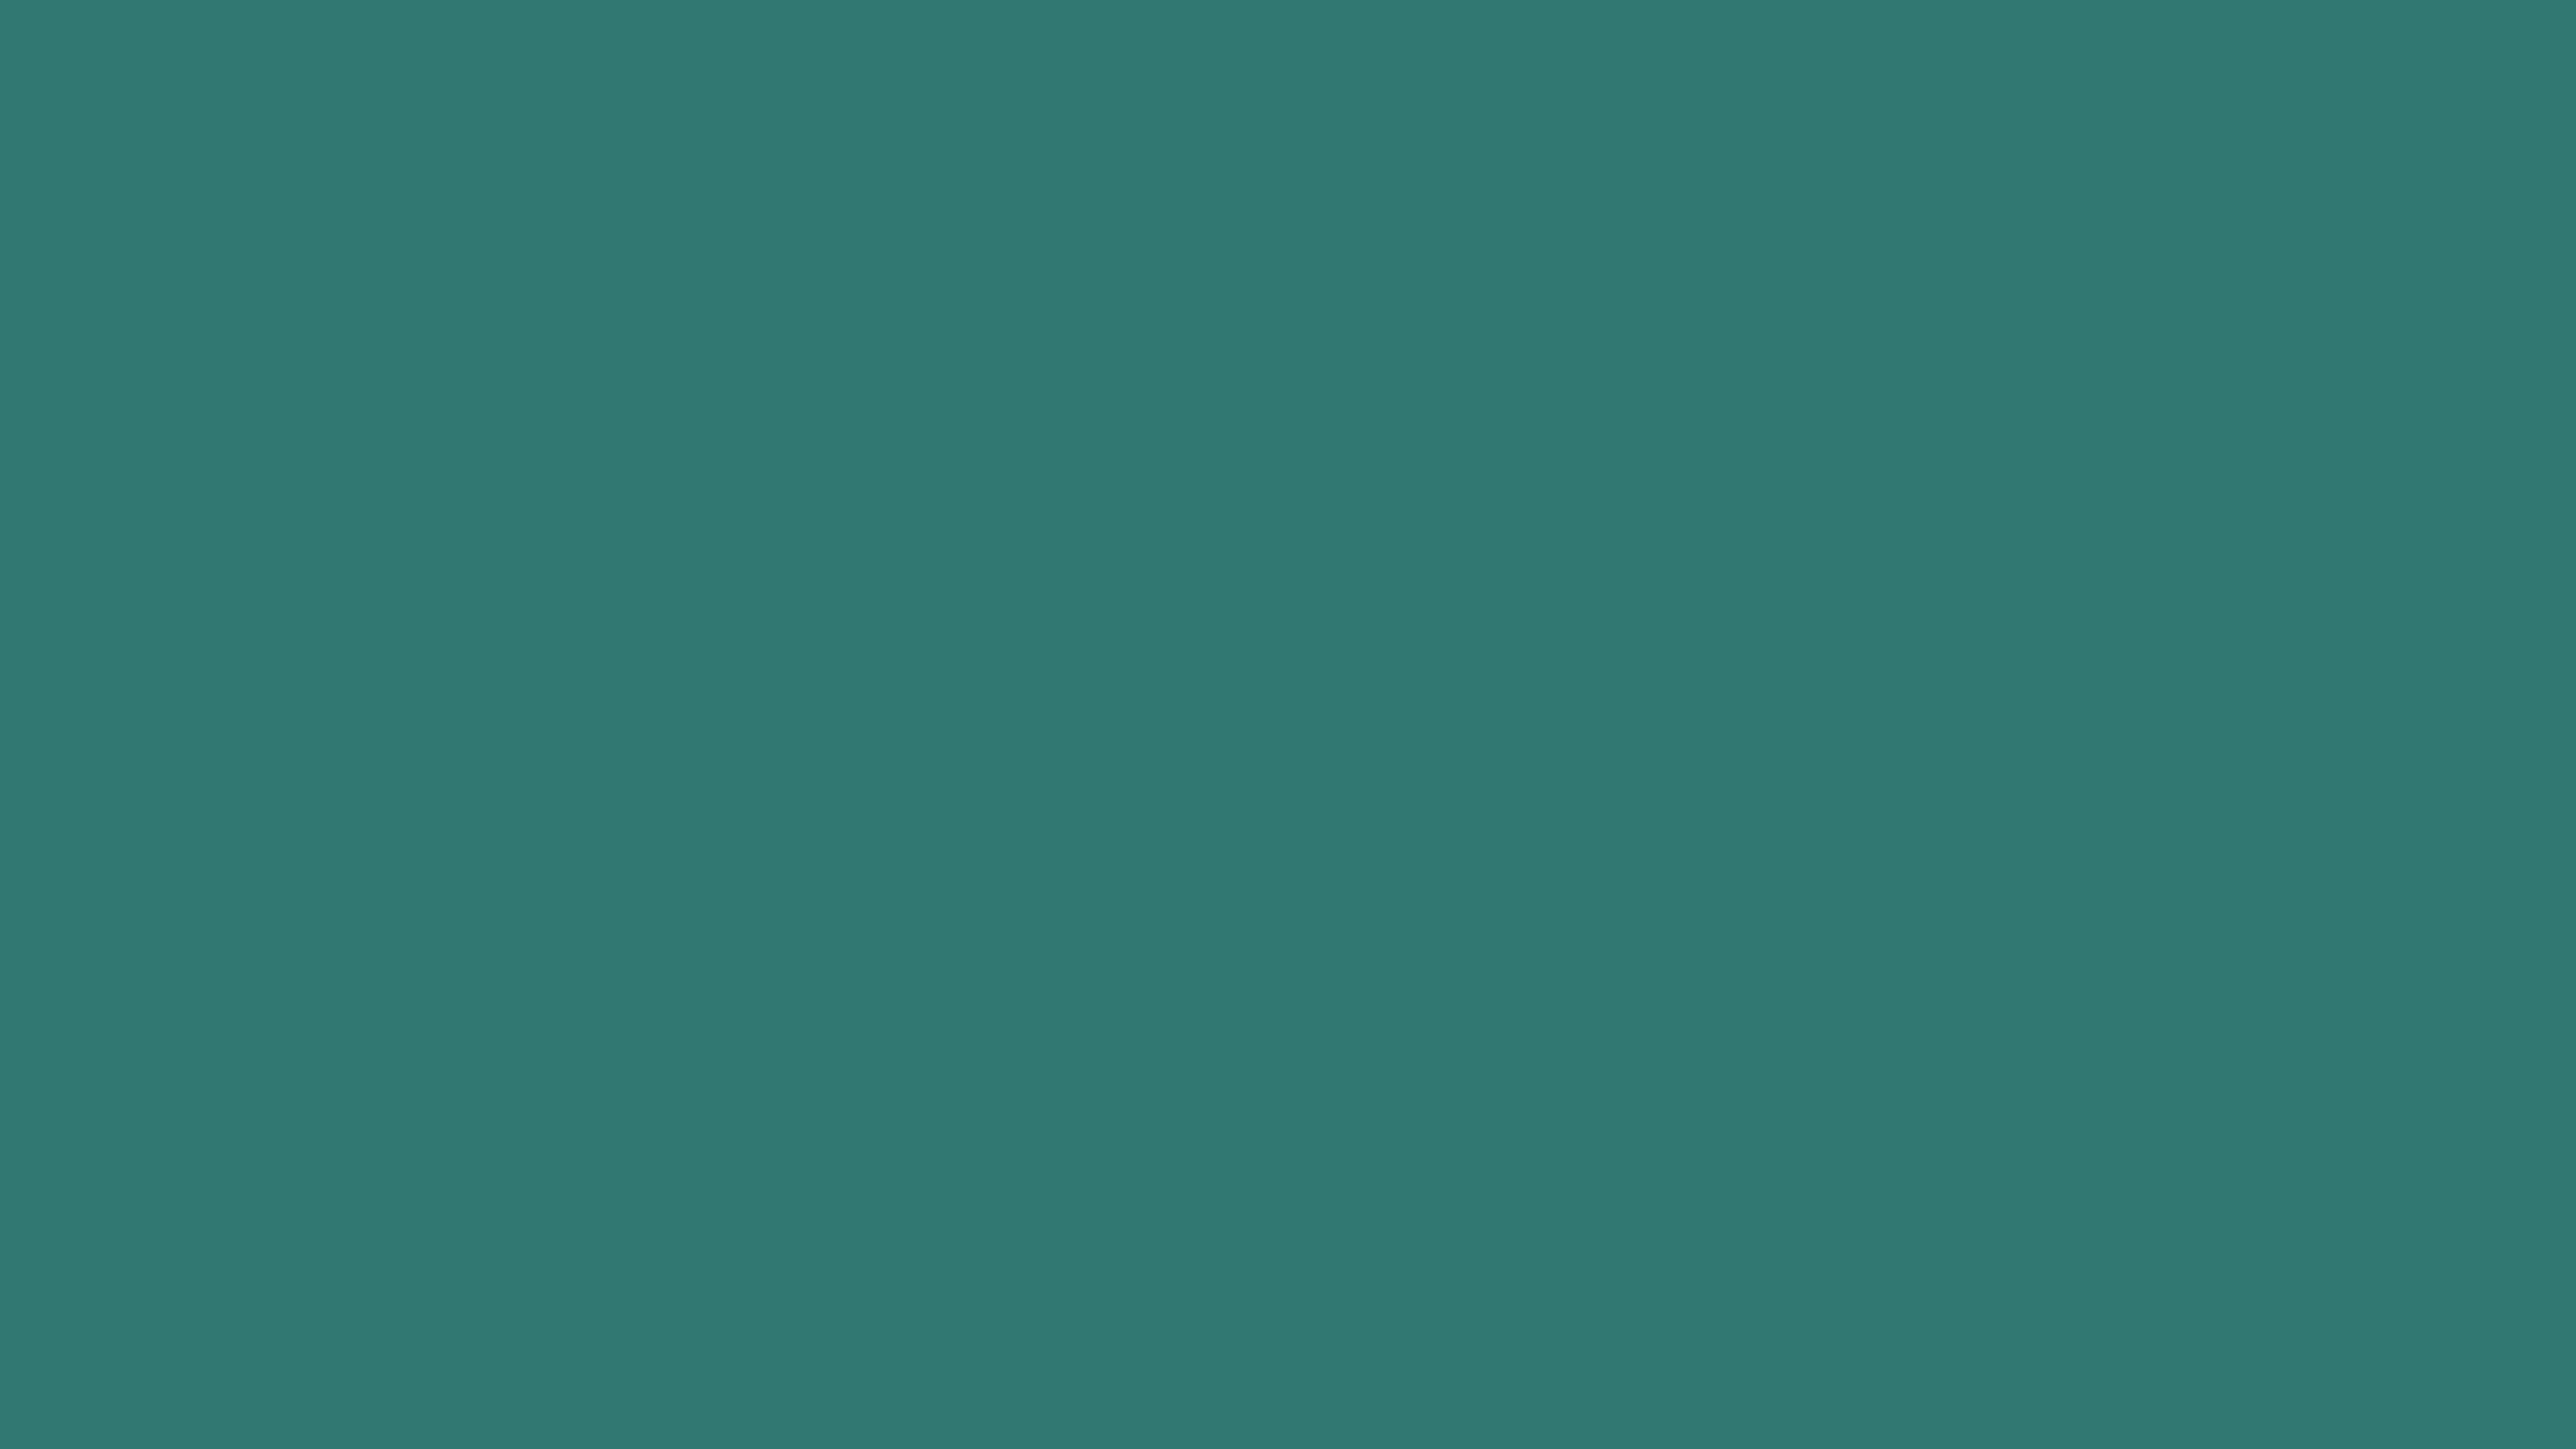 4096x2304 Myrtle Green Solid Color Background